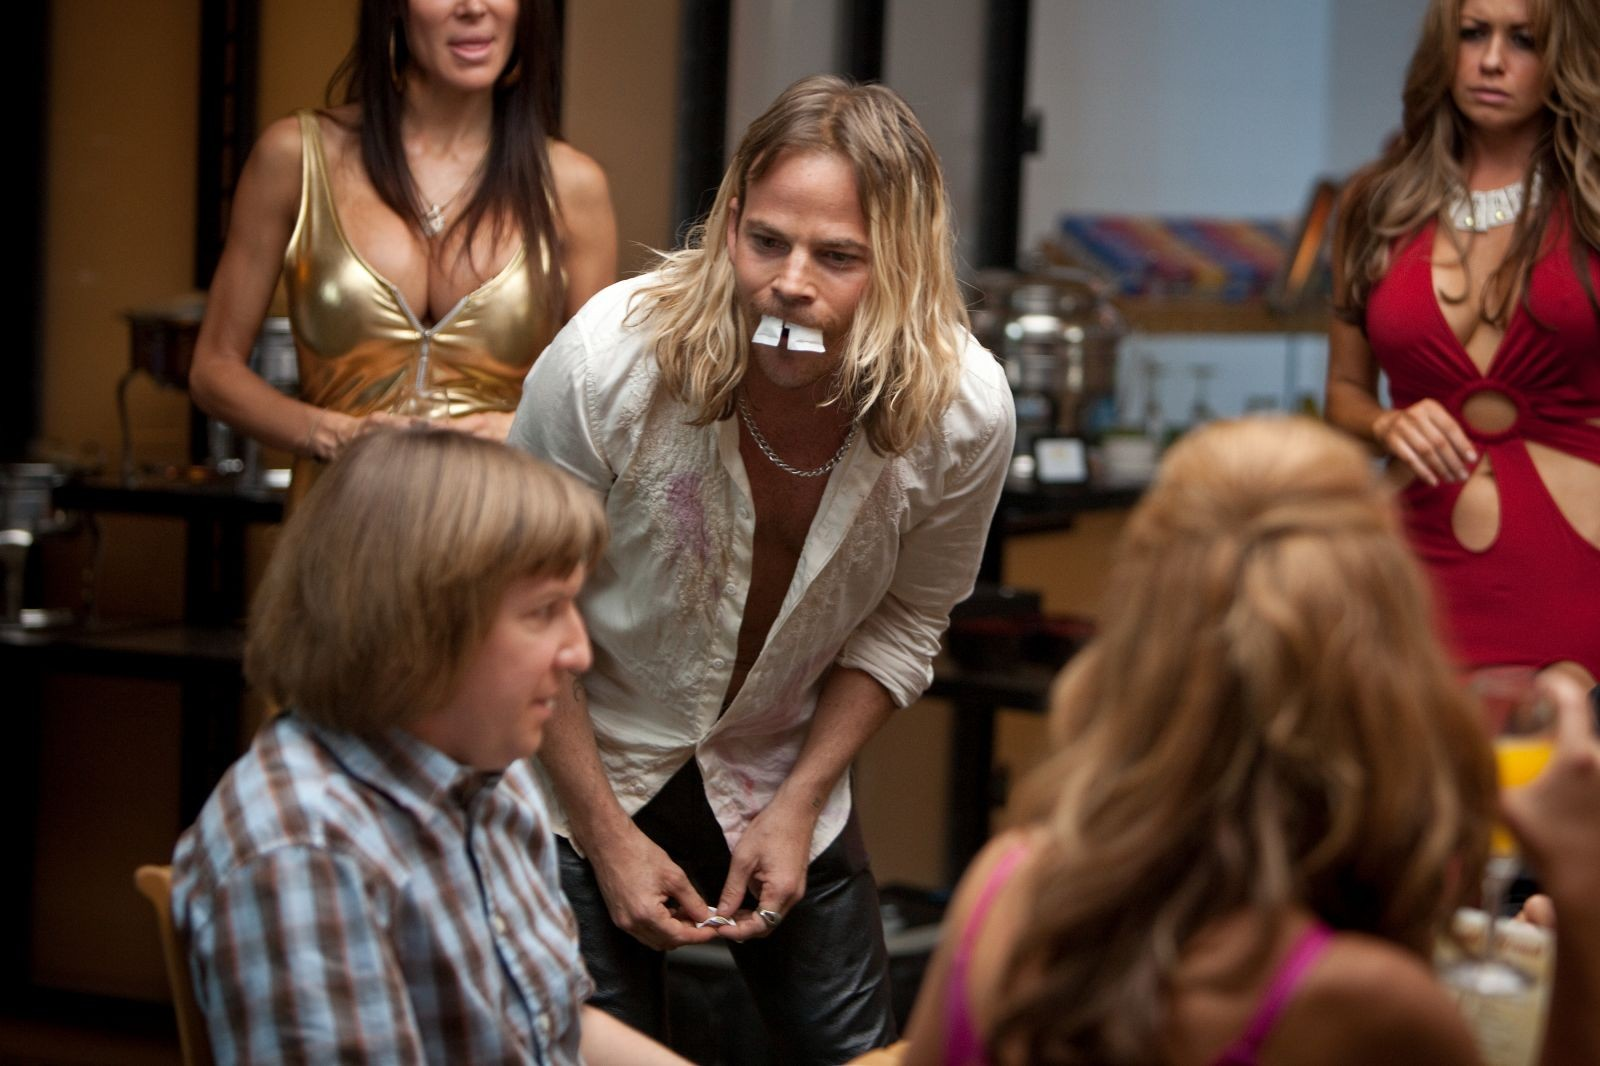 Natalia Fernandez Servant Video Porno bucky larson: born to be star dvd review by: matt c